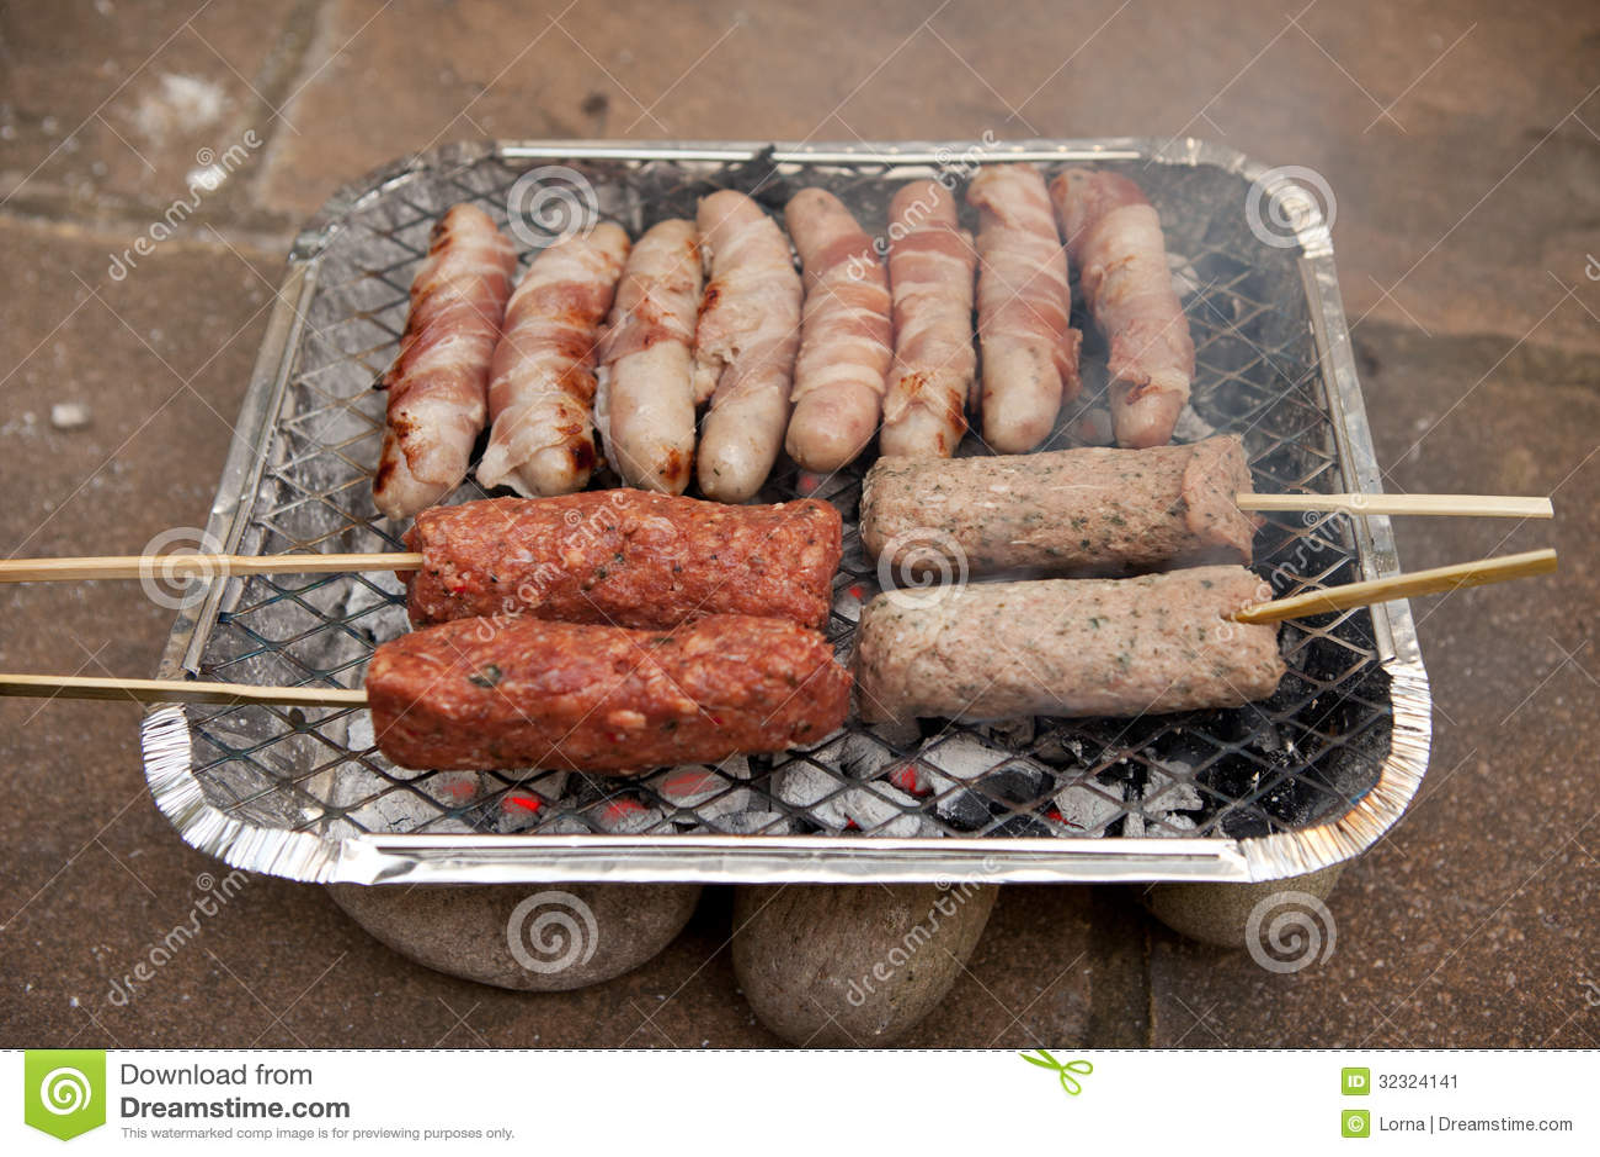 saucisse de chiche kebab de barbecue de bbq jetable image stock image du cuisinier heat 32324141. Black Bedroom Furniture Sets. Home Design Ideas